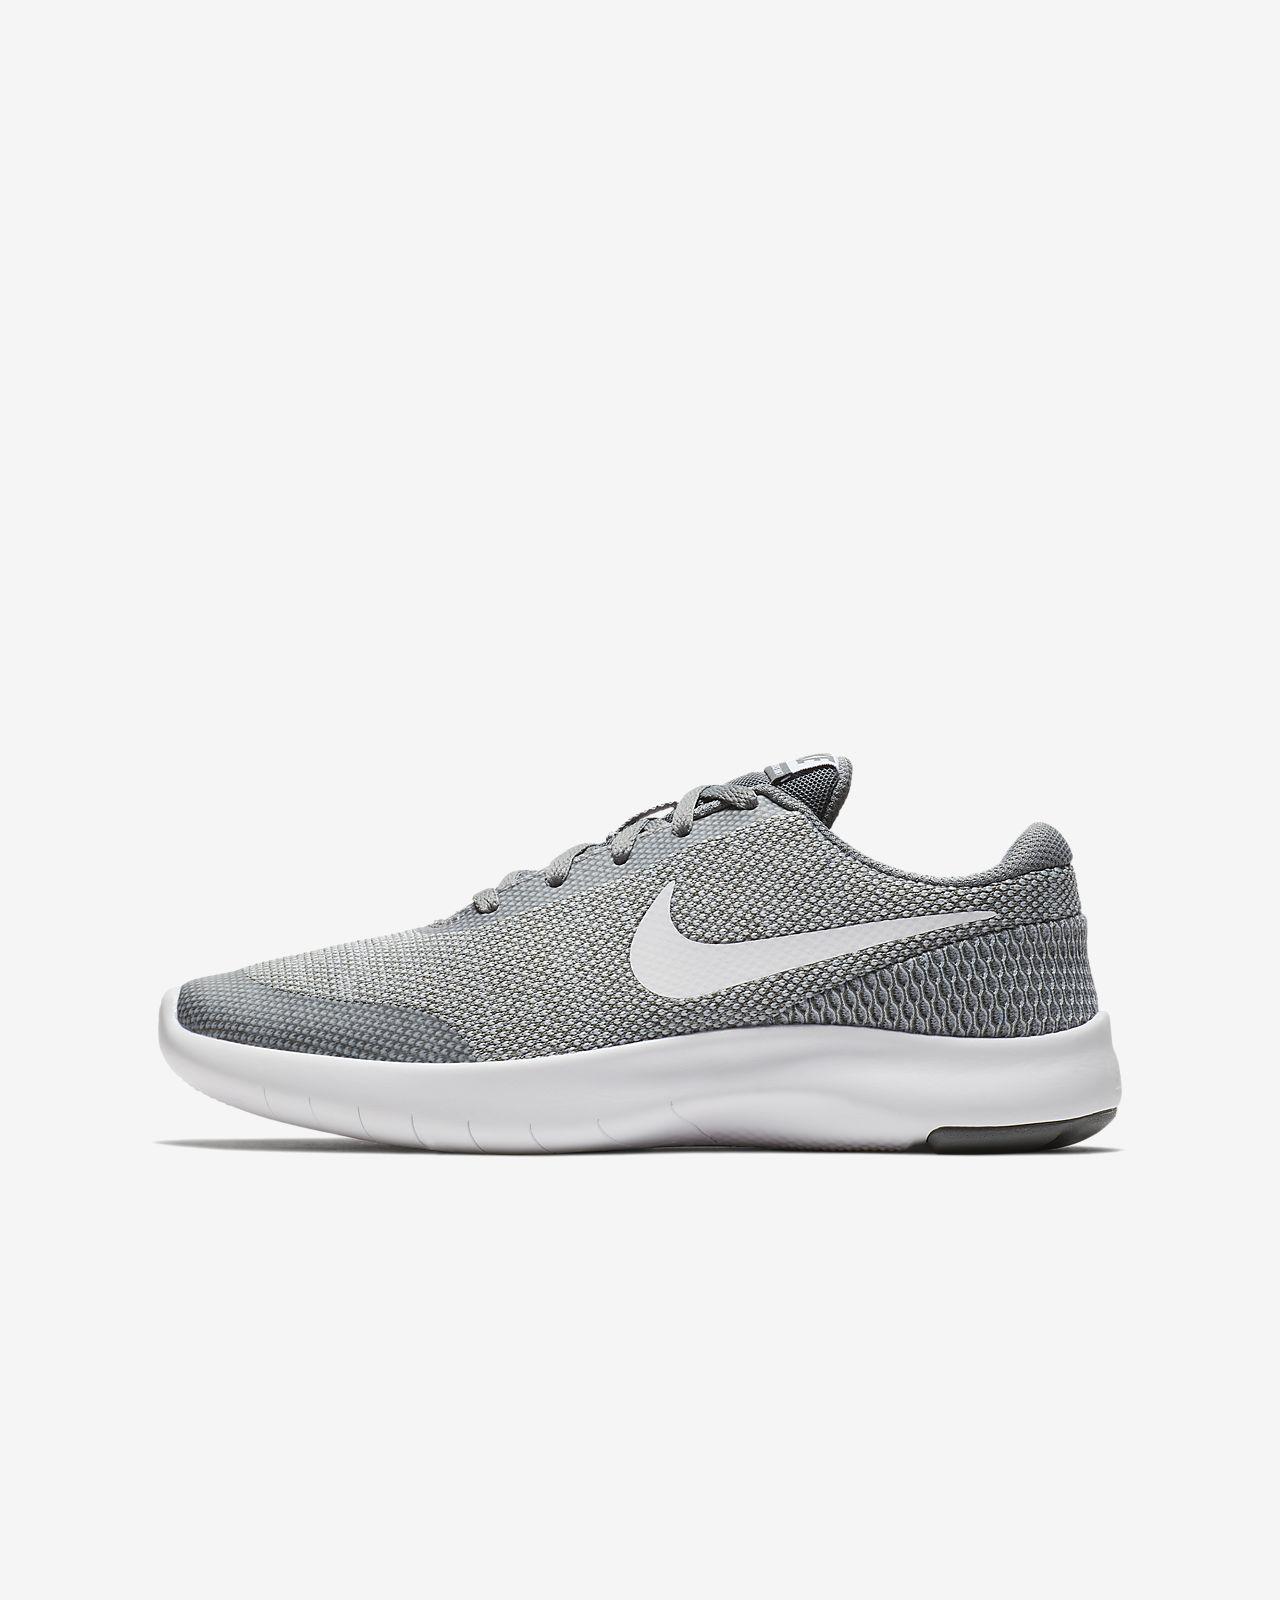 Nike JR Mercurialx Victry 6 CR7 IC, Chaussures de Football Mixte Enfant, Blanc (Teinte Bleue/Blanc/Teinte Bleue/Noir), 35.5 EU